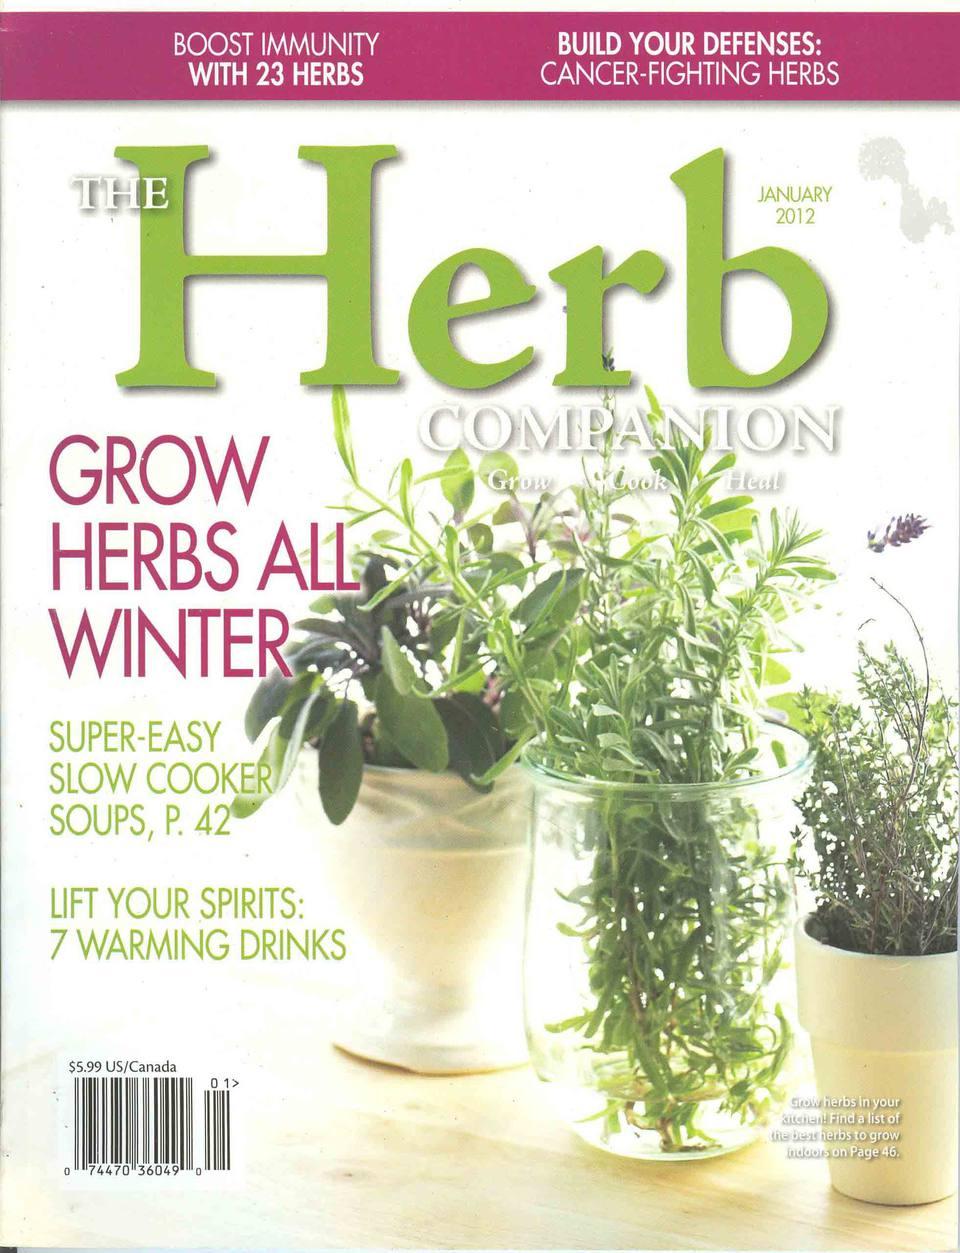 The Herbal Companion magazine